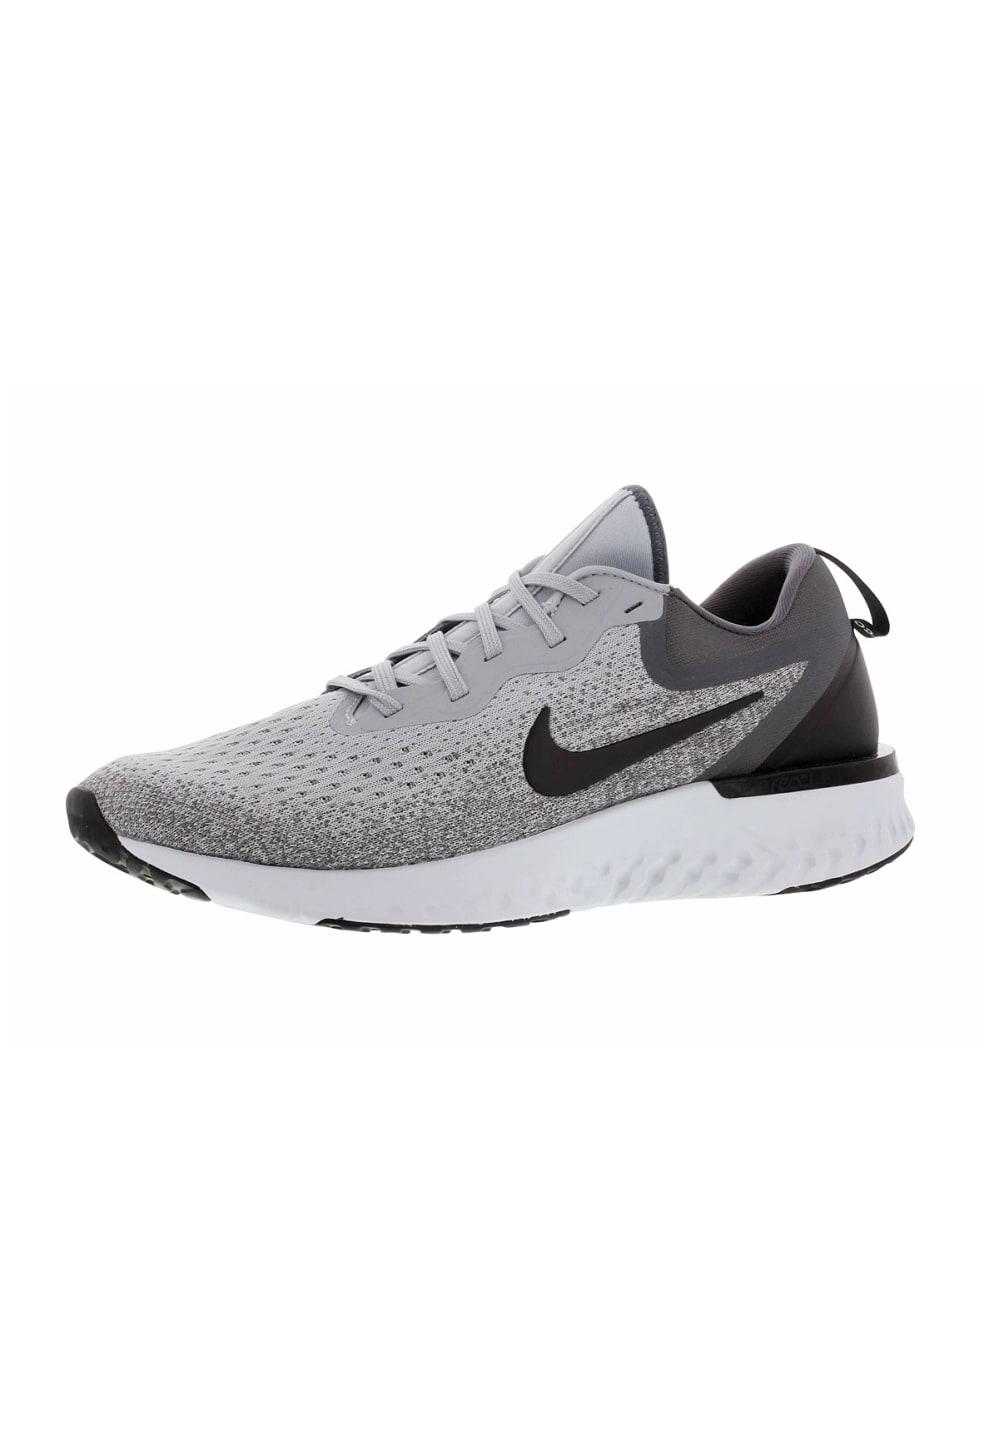 Nike Odyssey React - Running shoes for Men - Grey